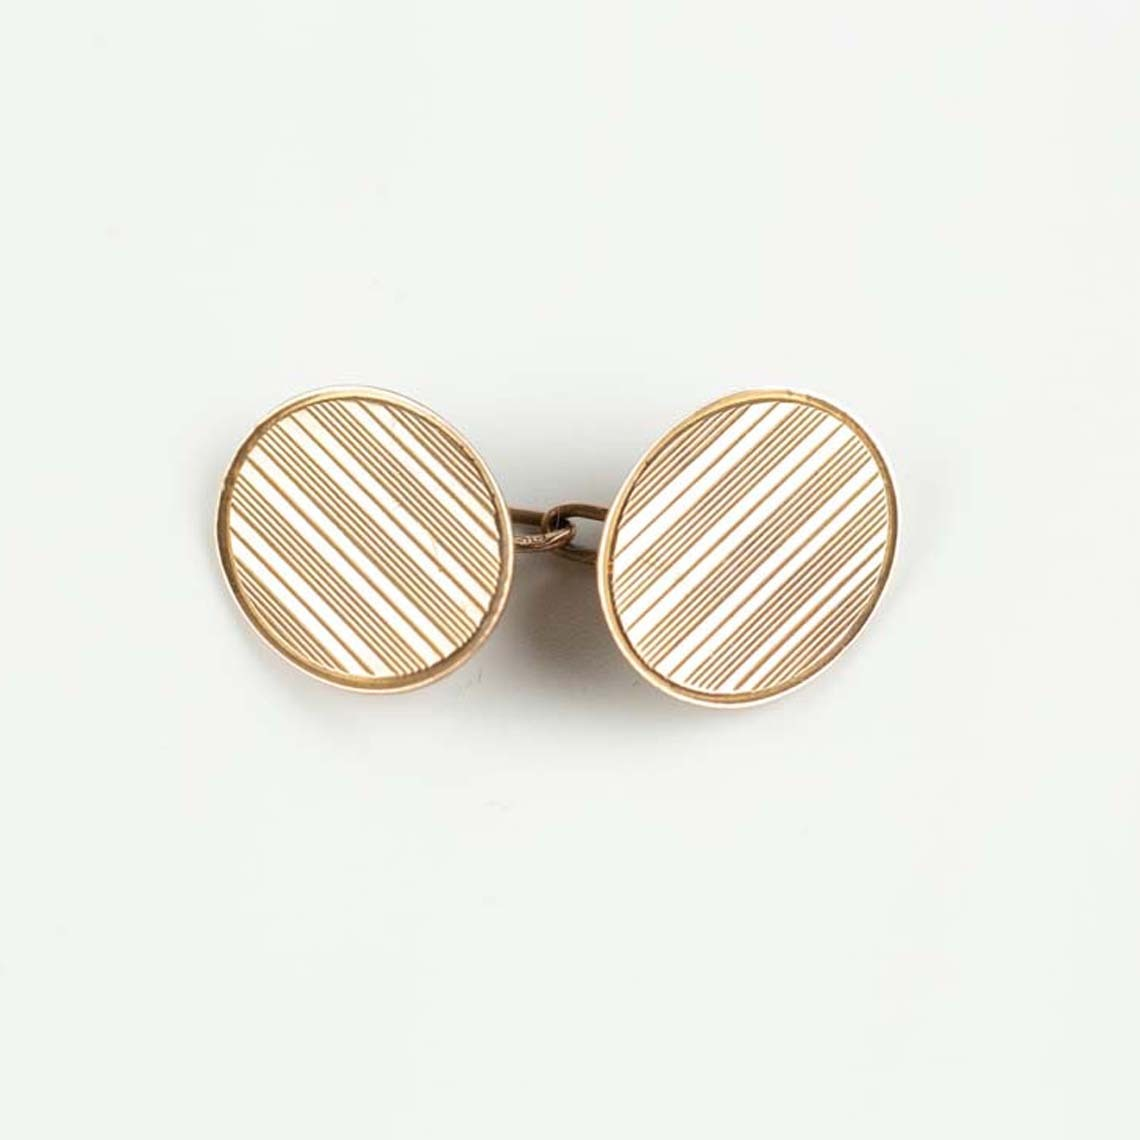 Rose gold cufflinks